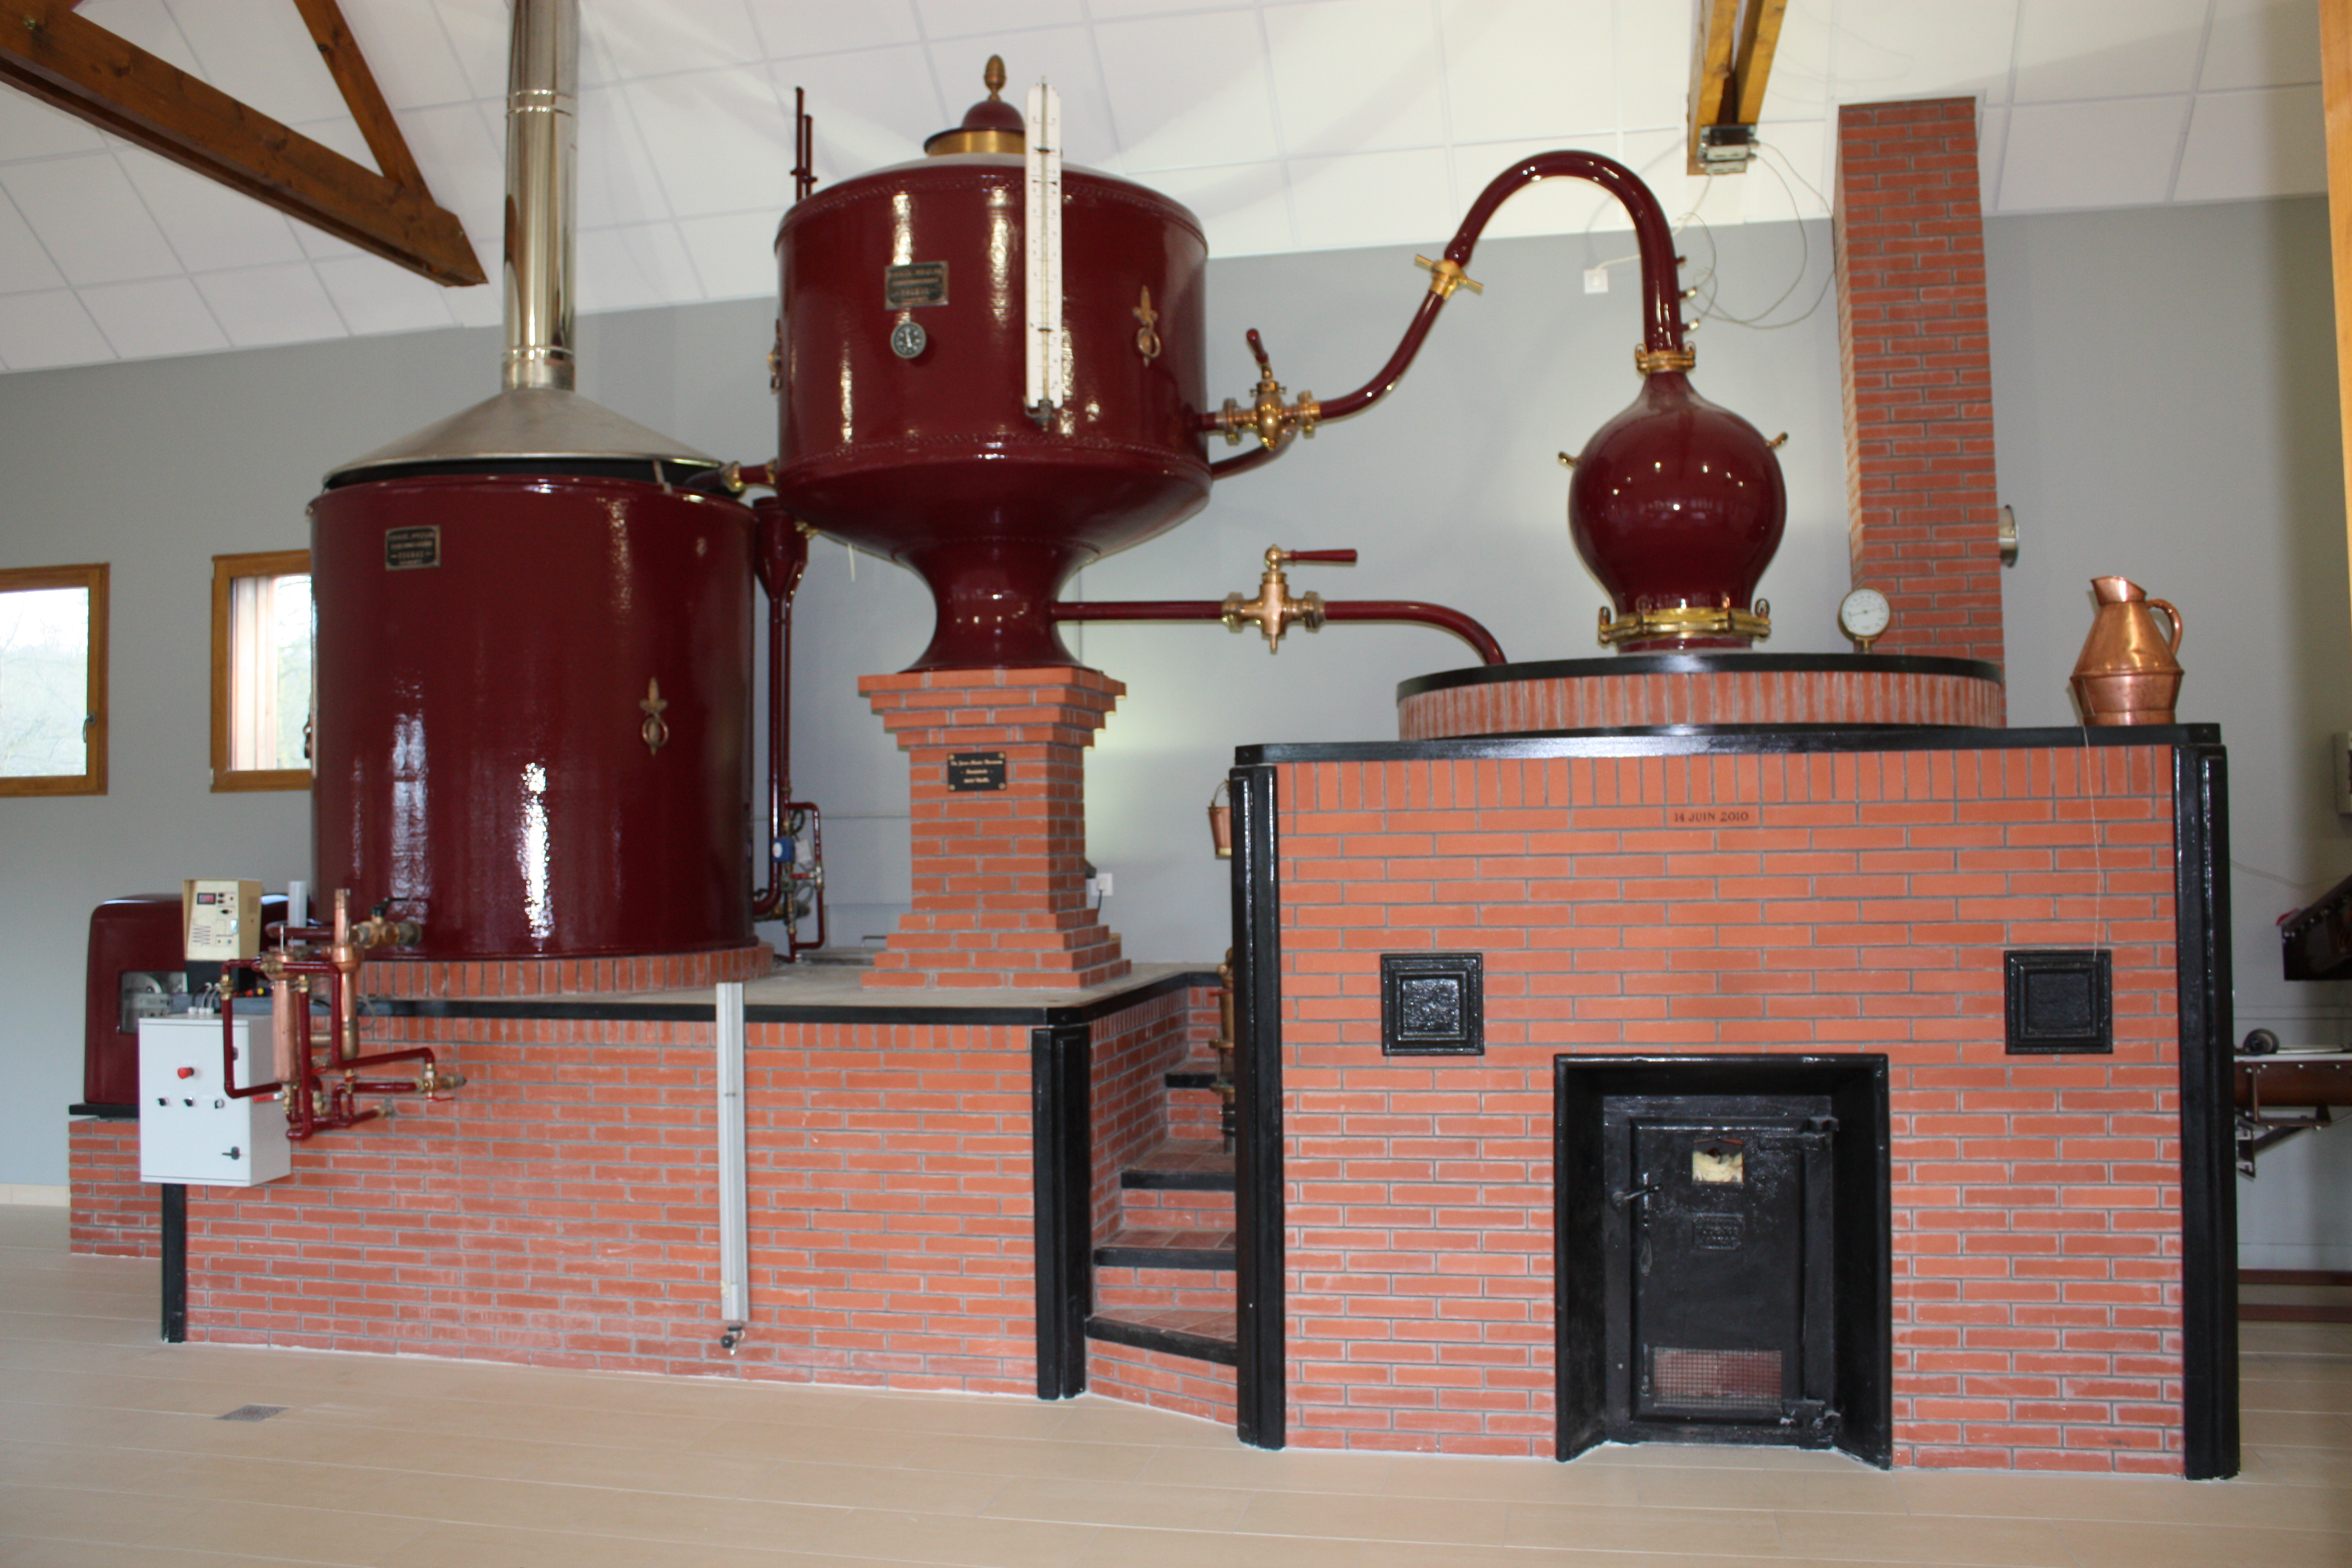 Calvados Time : Brunch au pied des alambics Cambremer